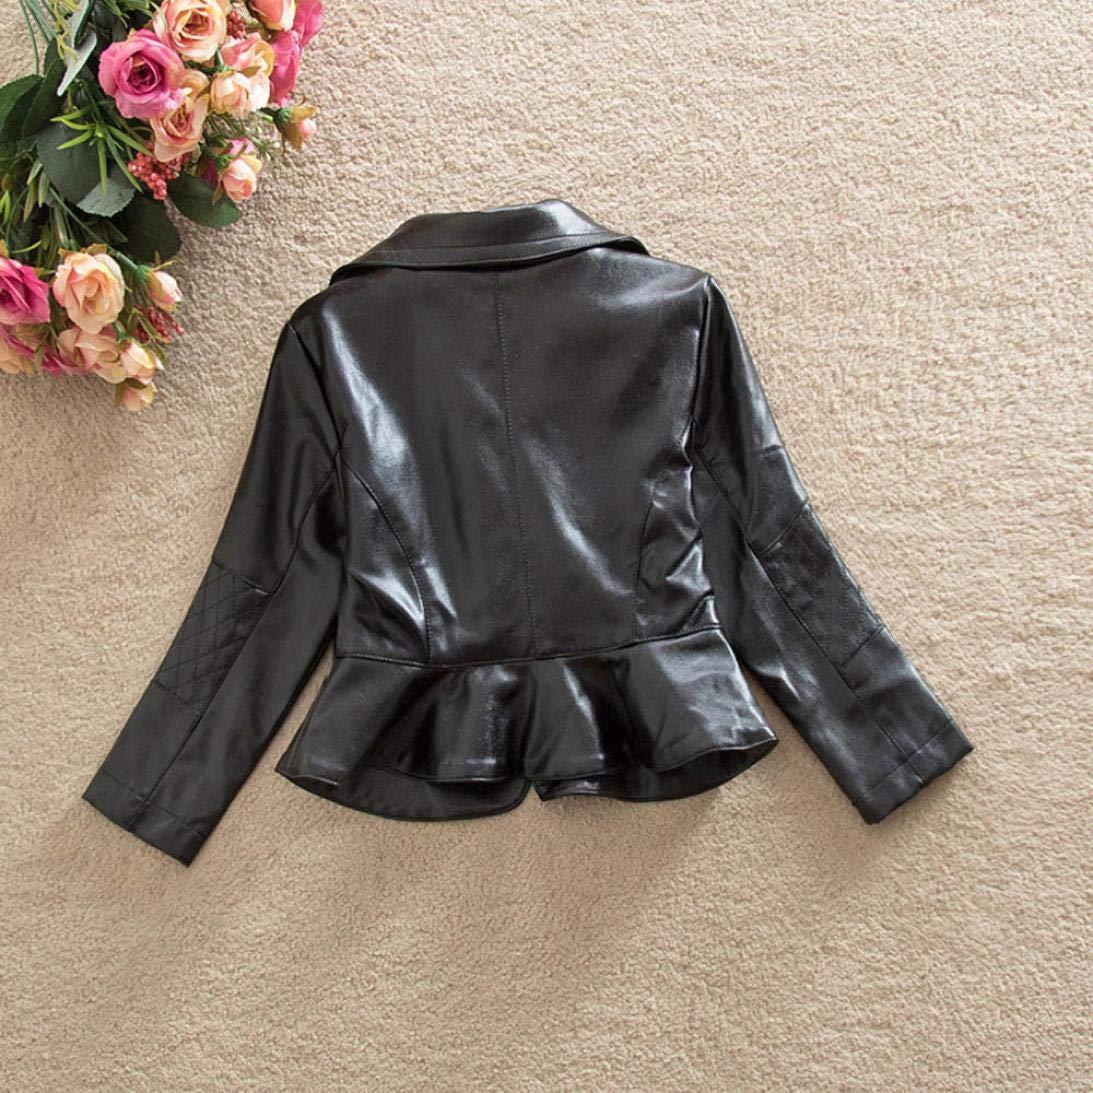 18a9eba21 Amazon.com: Girls Short Jacket Coat 1-4 Years Old, Fashion Infant Toddler  Girls Kids Autumn Winter Leather Zipper Outerwear: Clothing